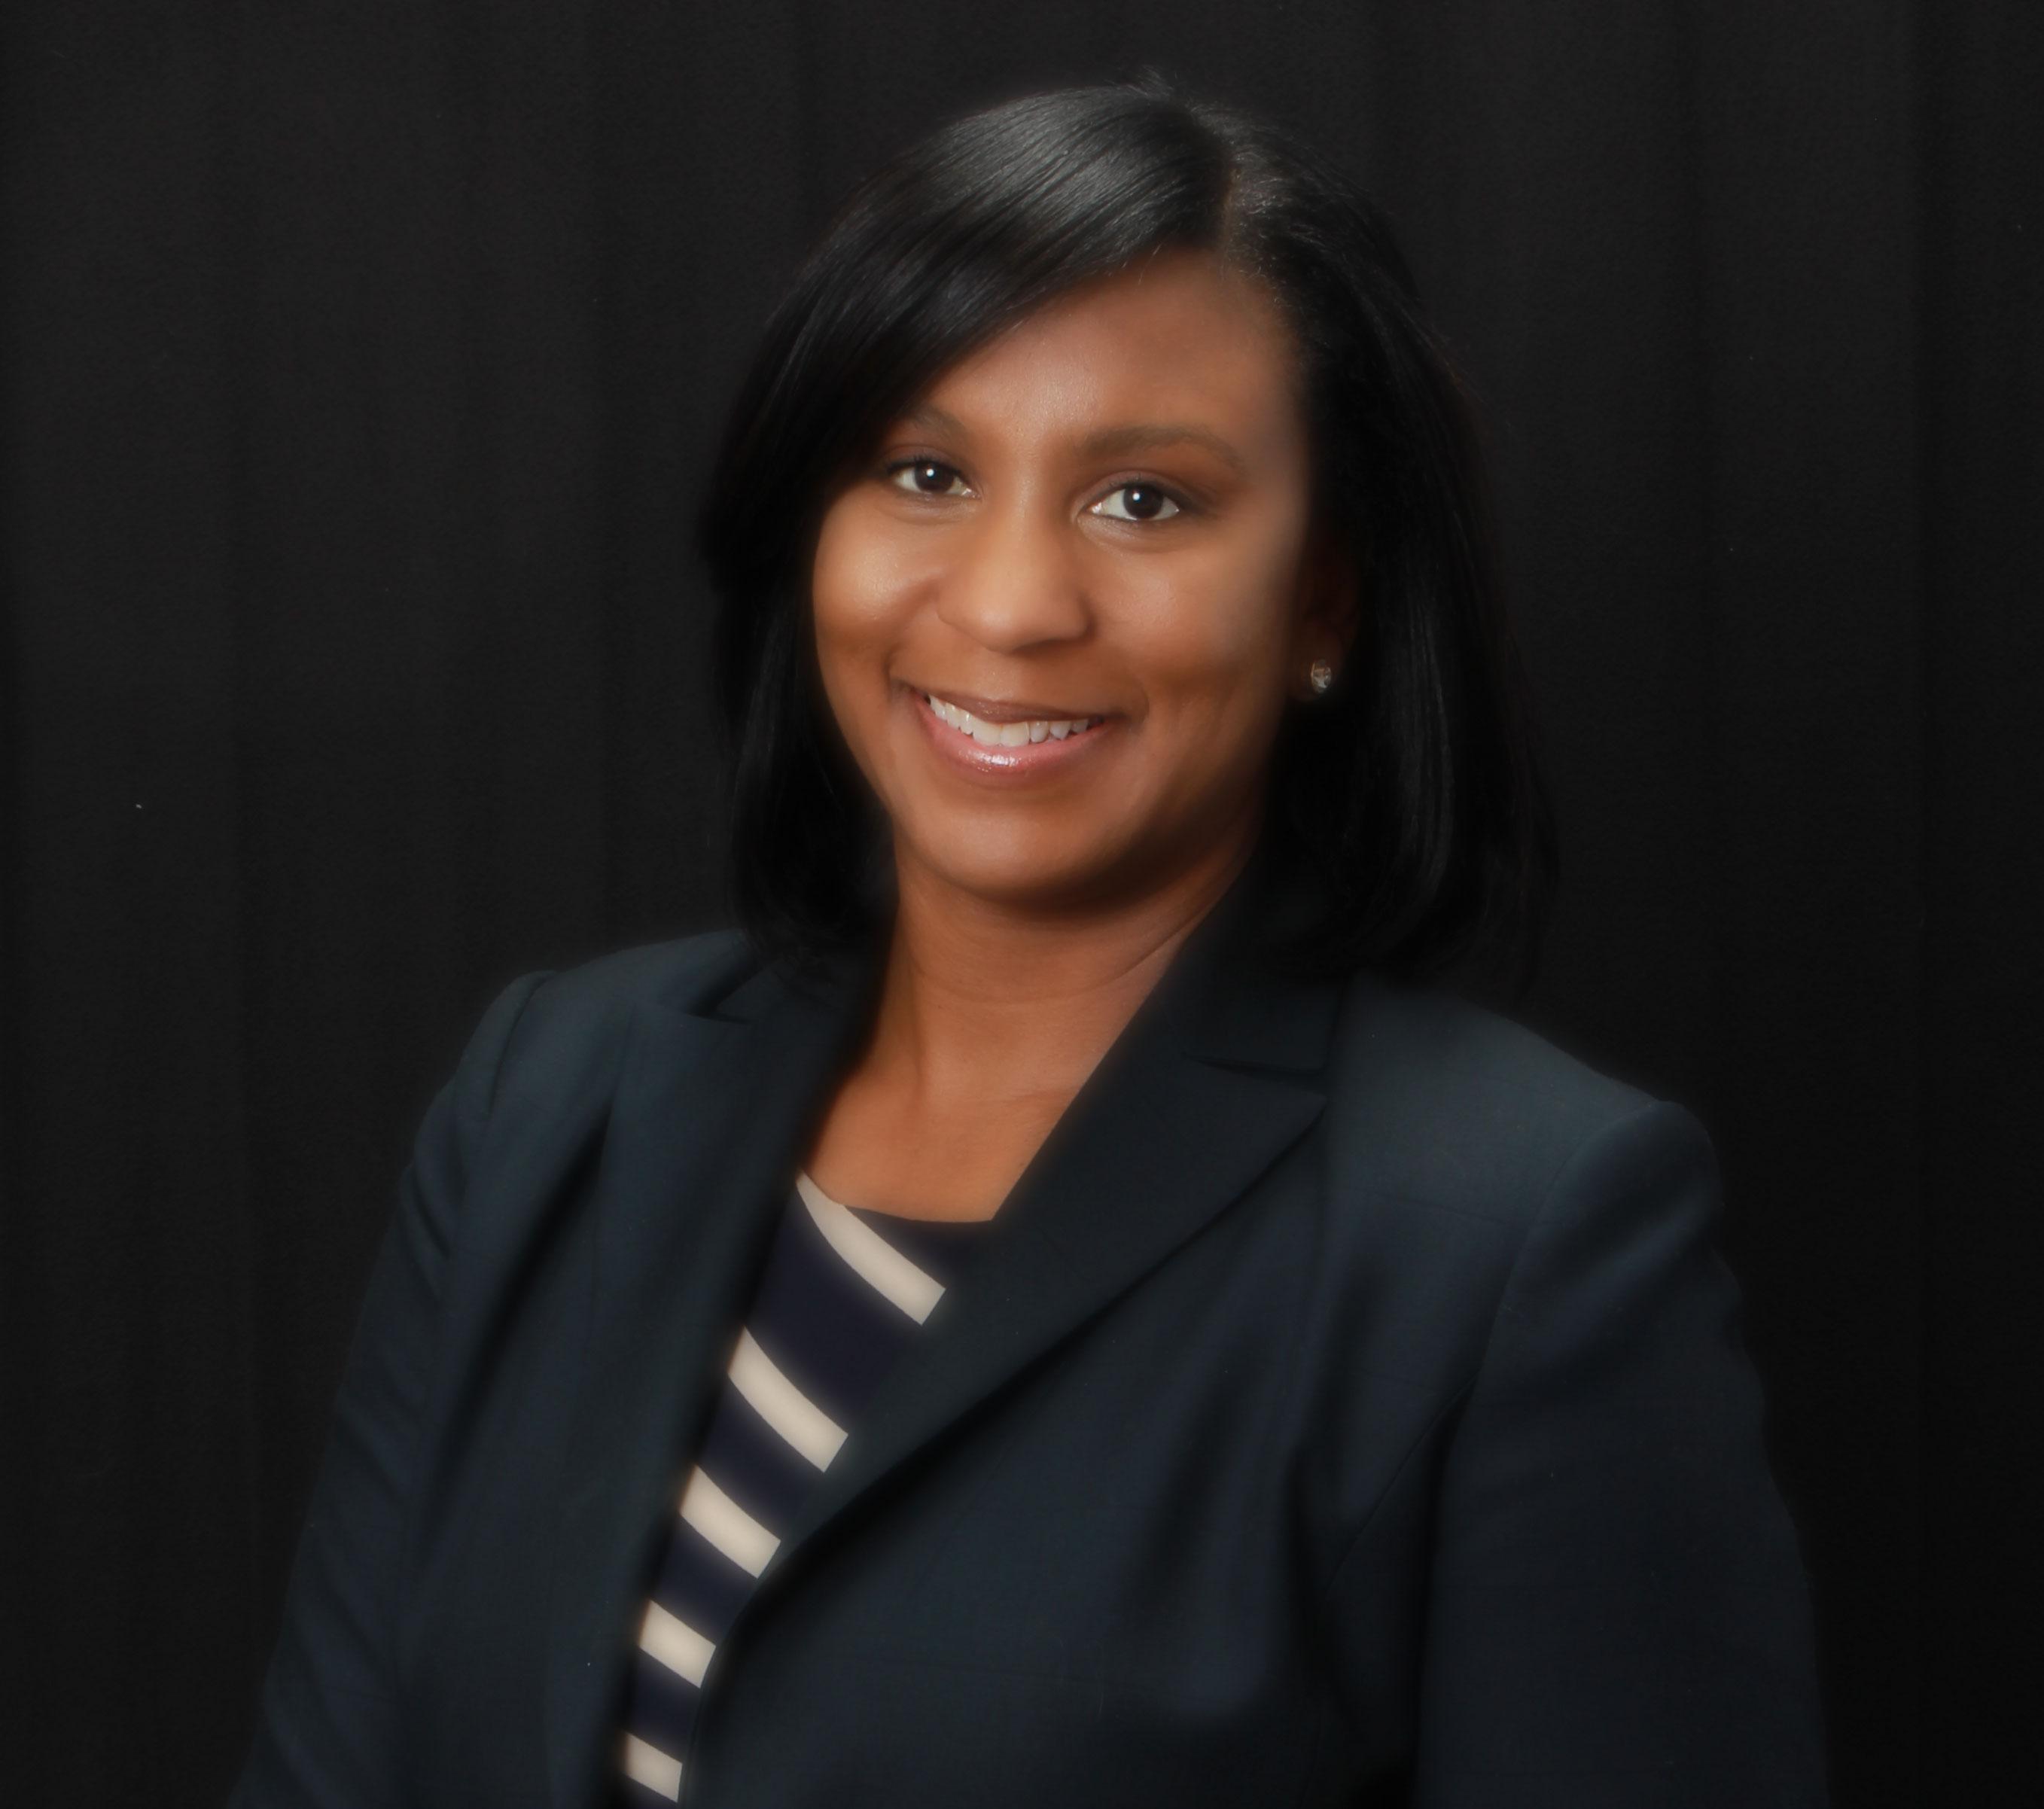 CaSonya Thomas, director of the Department of Behavioral Health